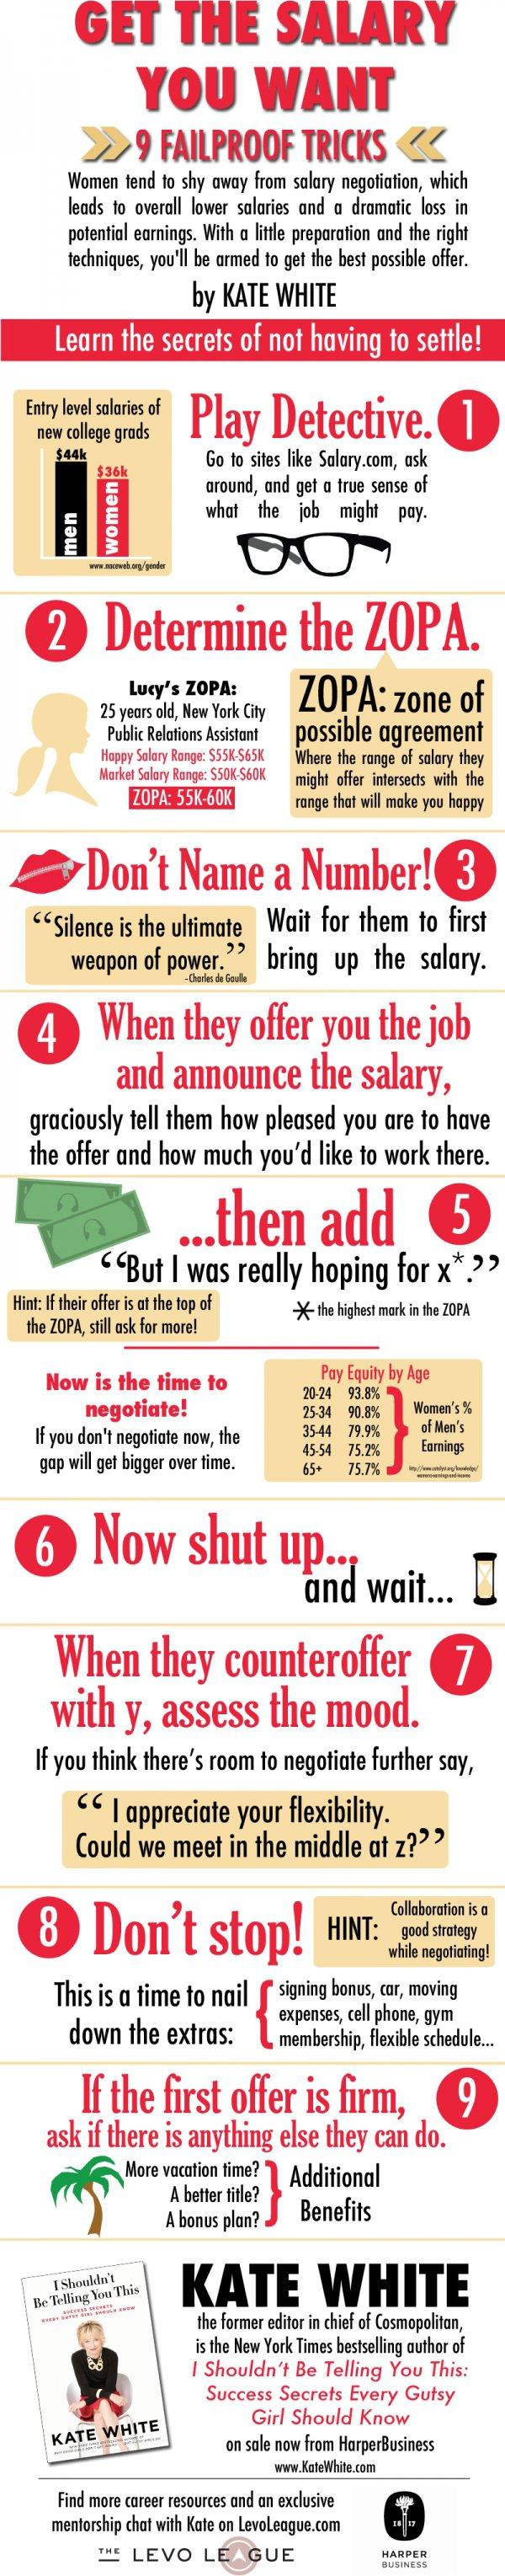 9 Failproof Salary Negotiation Tricks